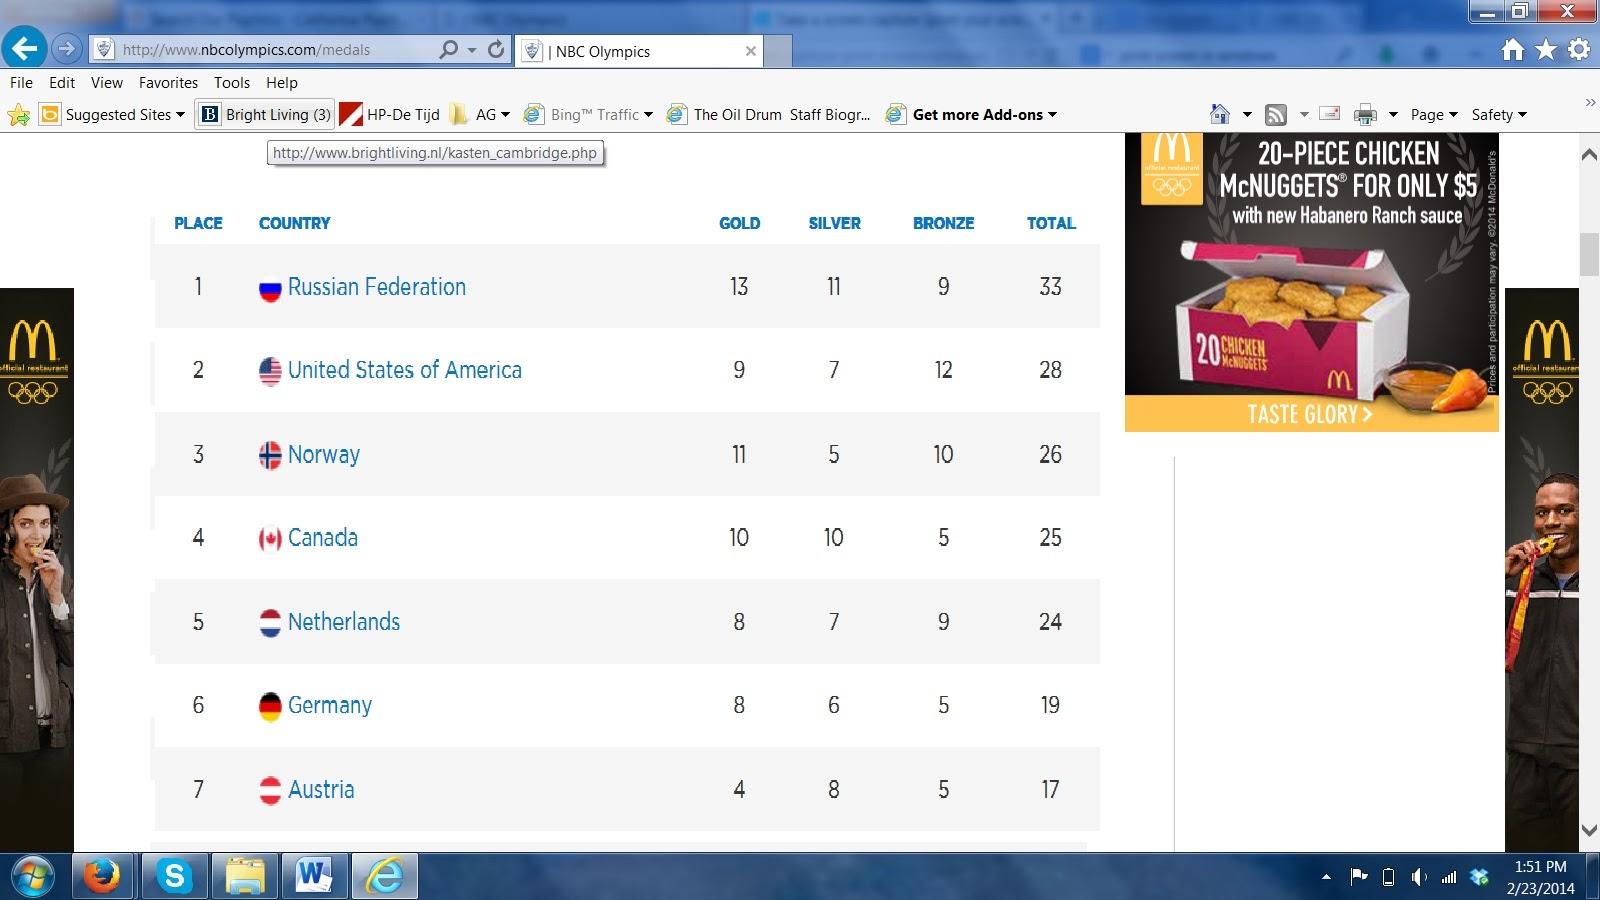 http://www.nbcolympics.com/medals